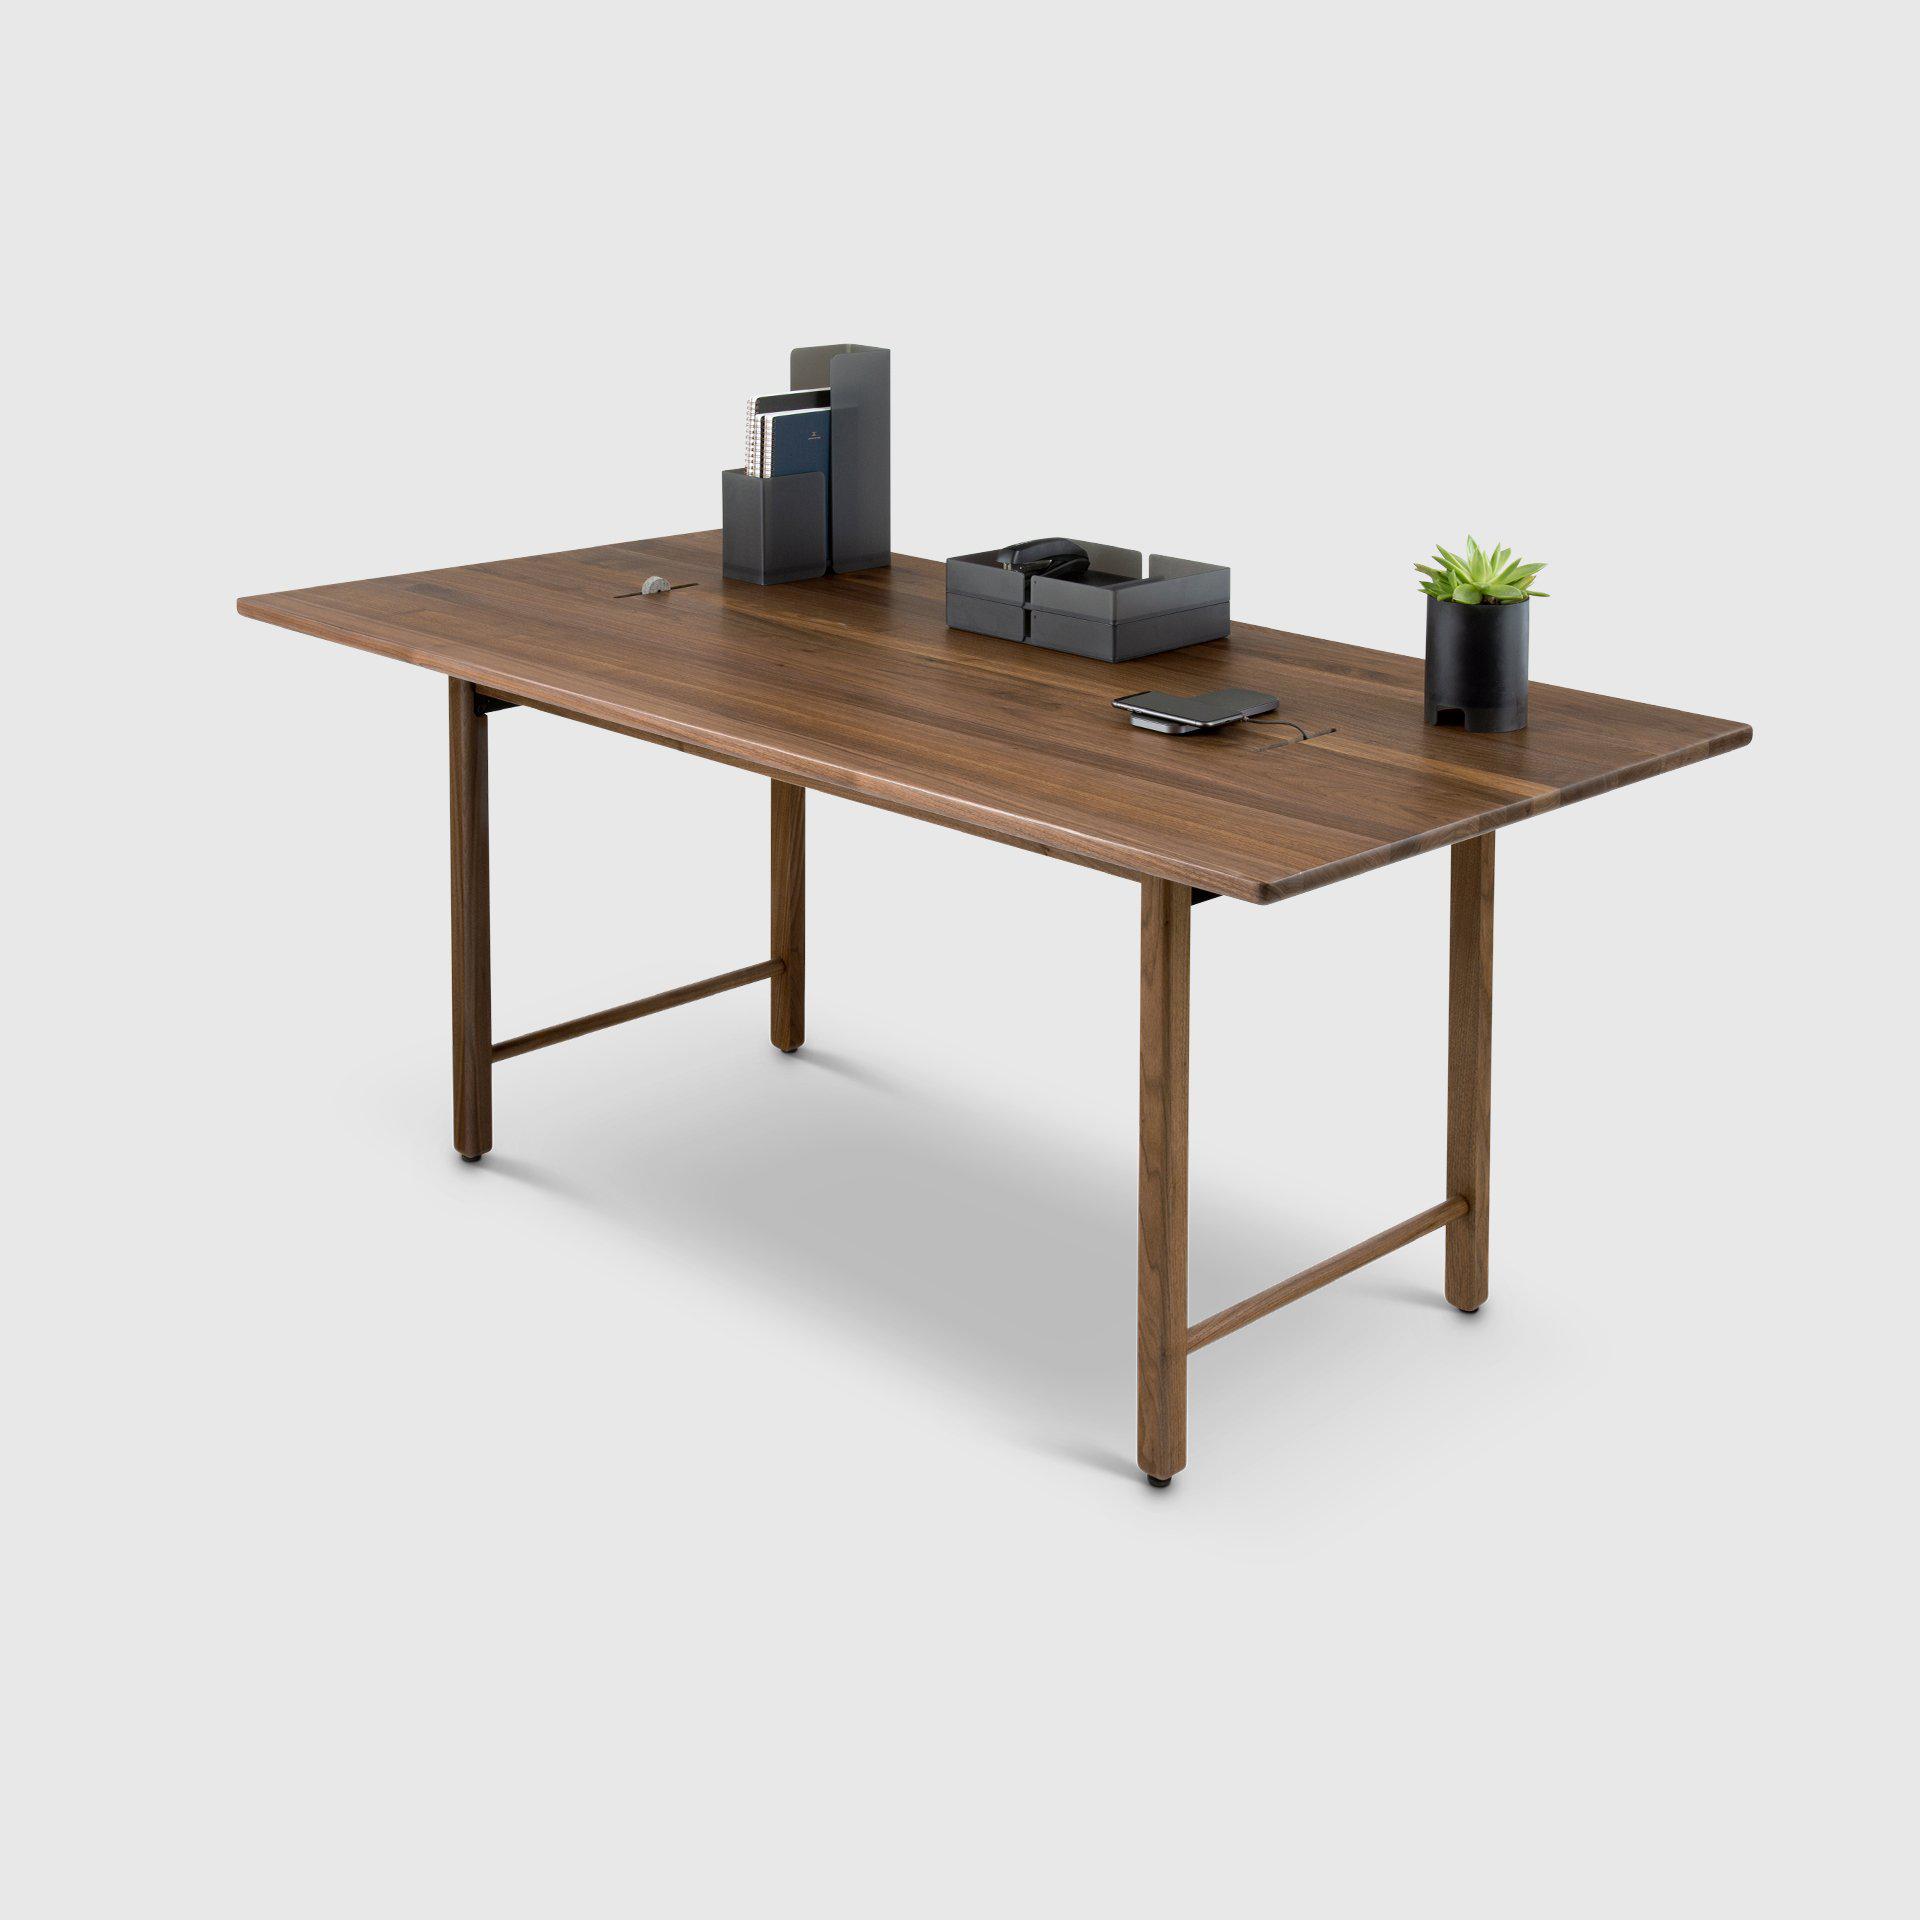 Artifox Modern Table